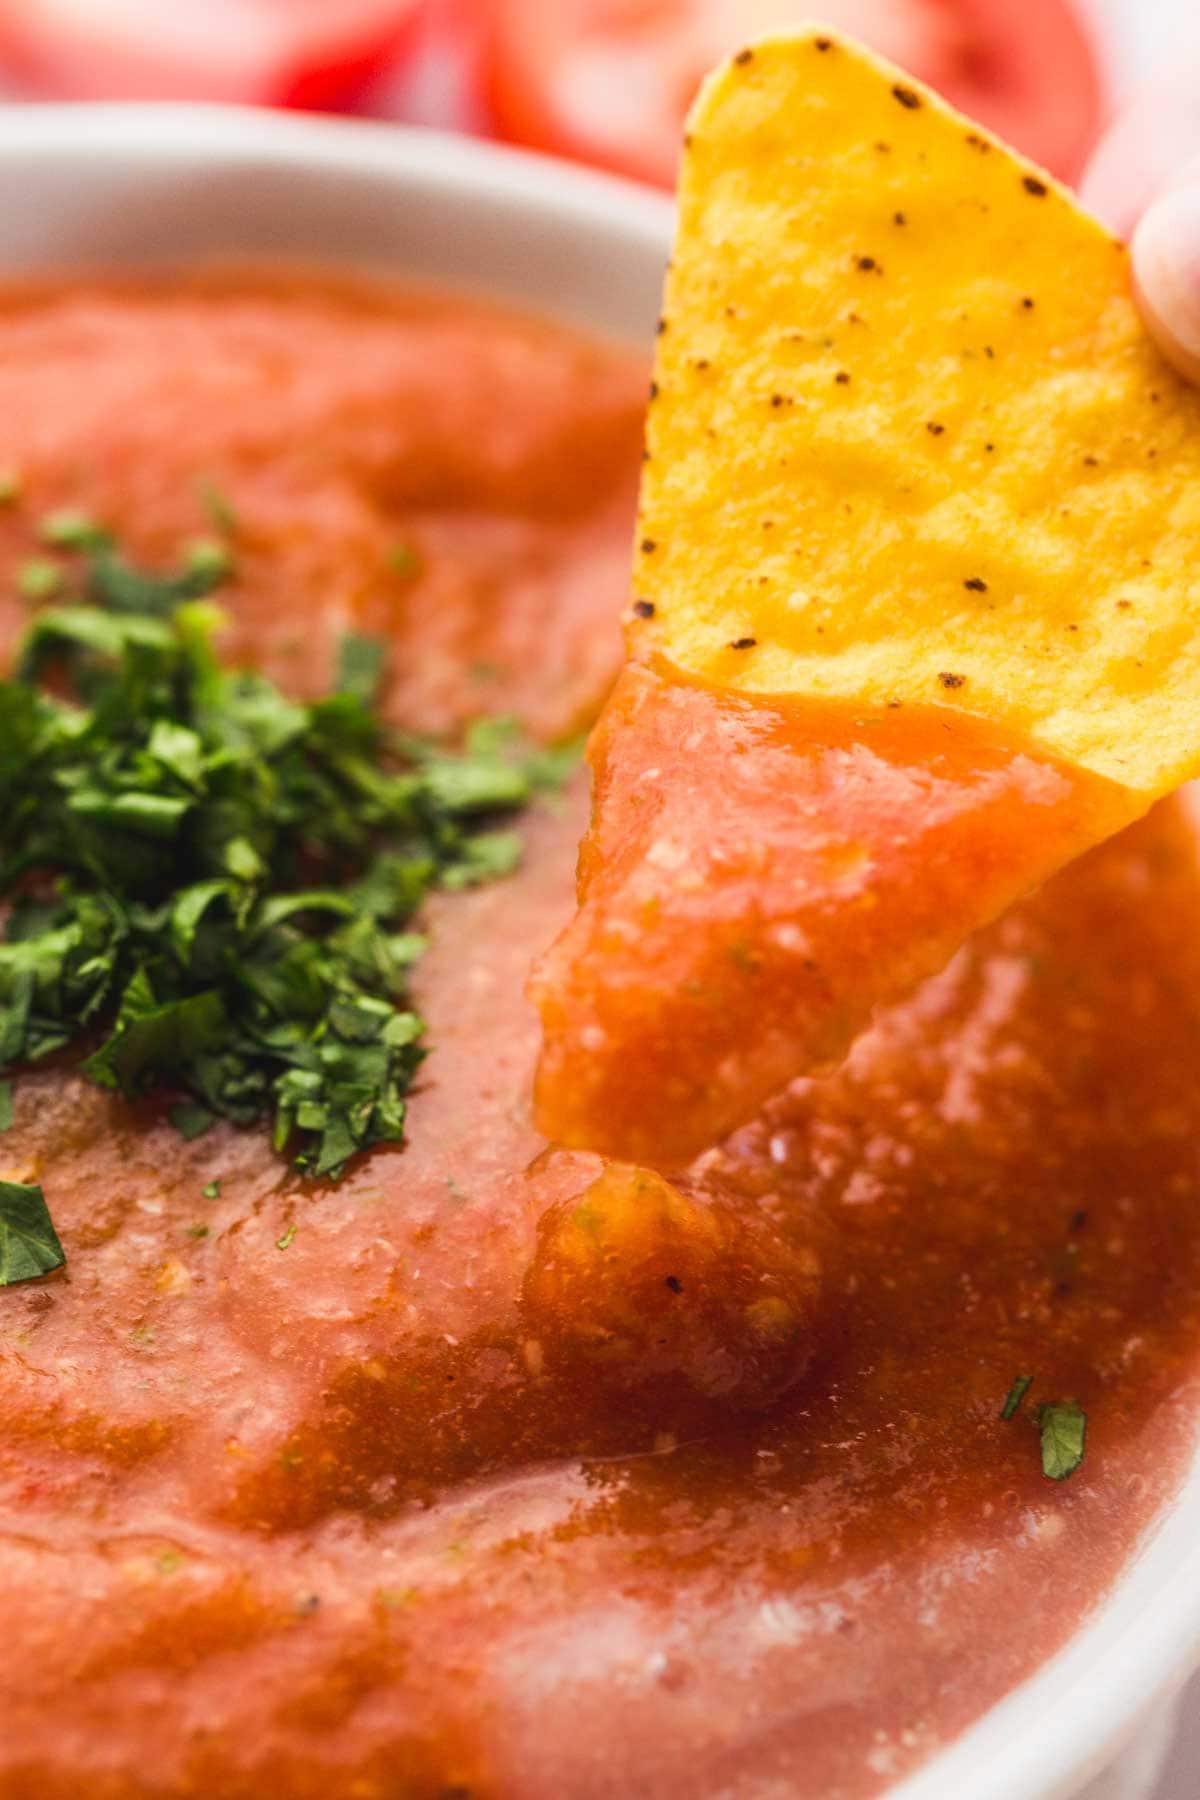 Salsa ranchera close up with a tortilla chip